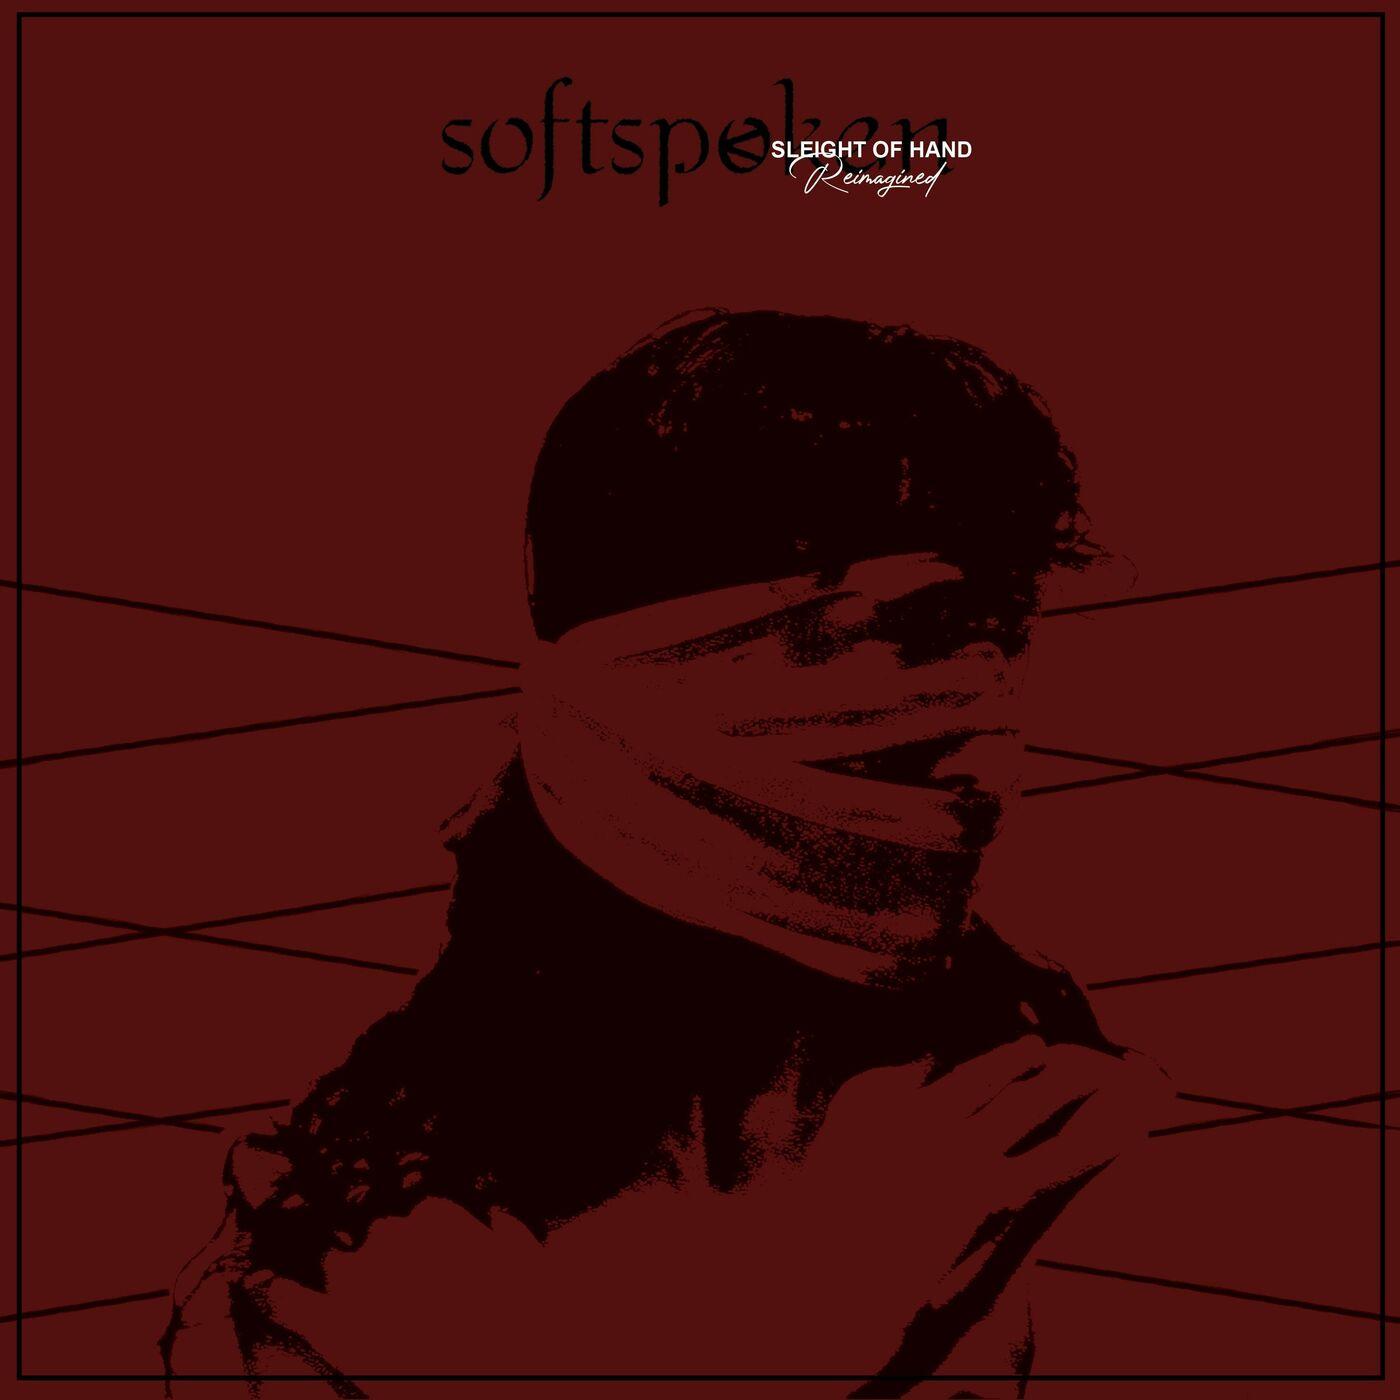 Softspoken - Sleight of Hand (Reimagined) [single] (2021)